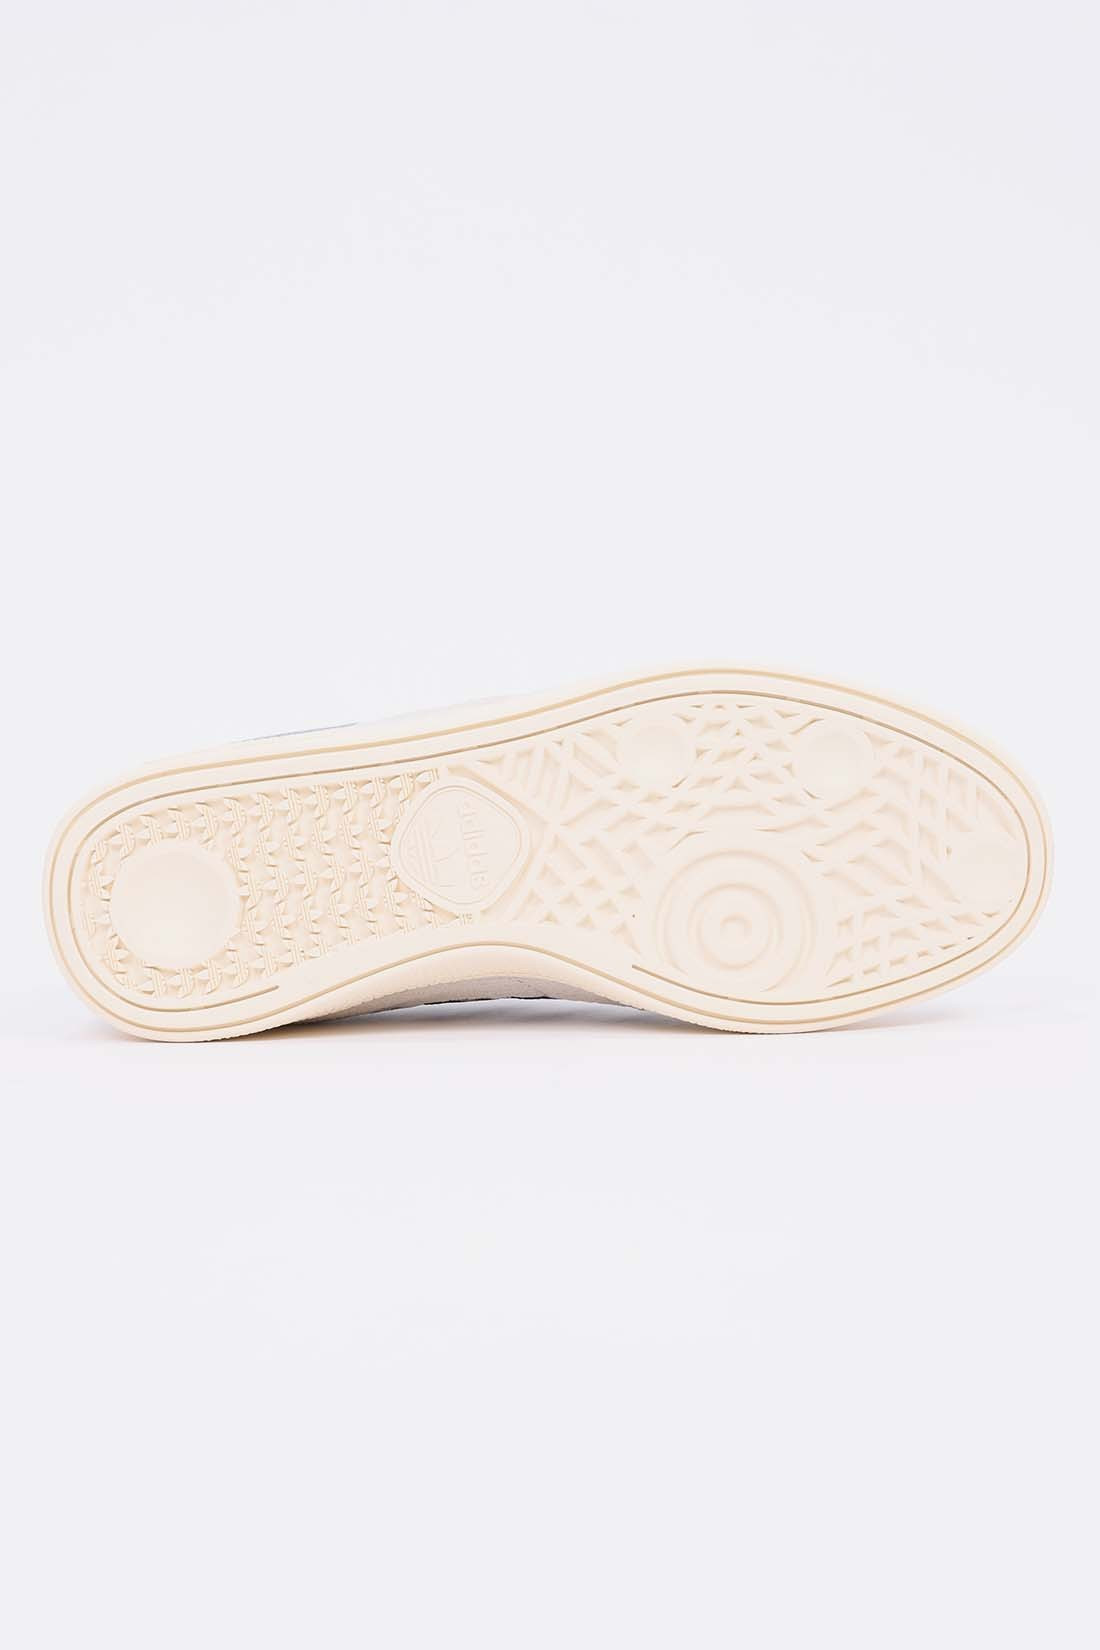 ADIDAS FOR WOMAN / Handball top Raw white